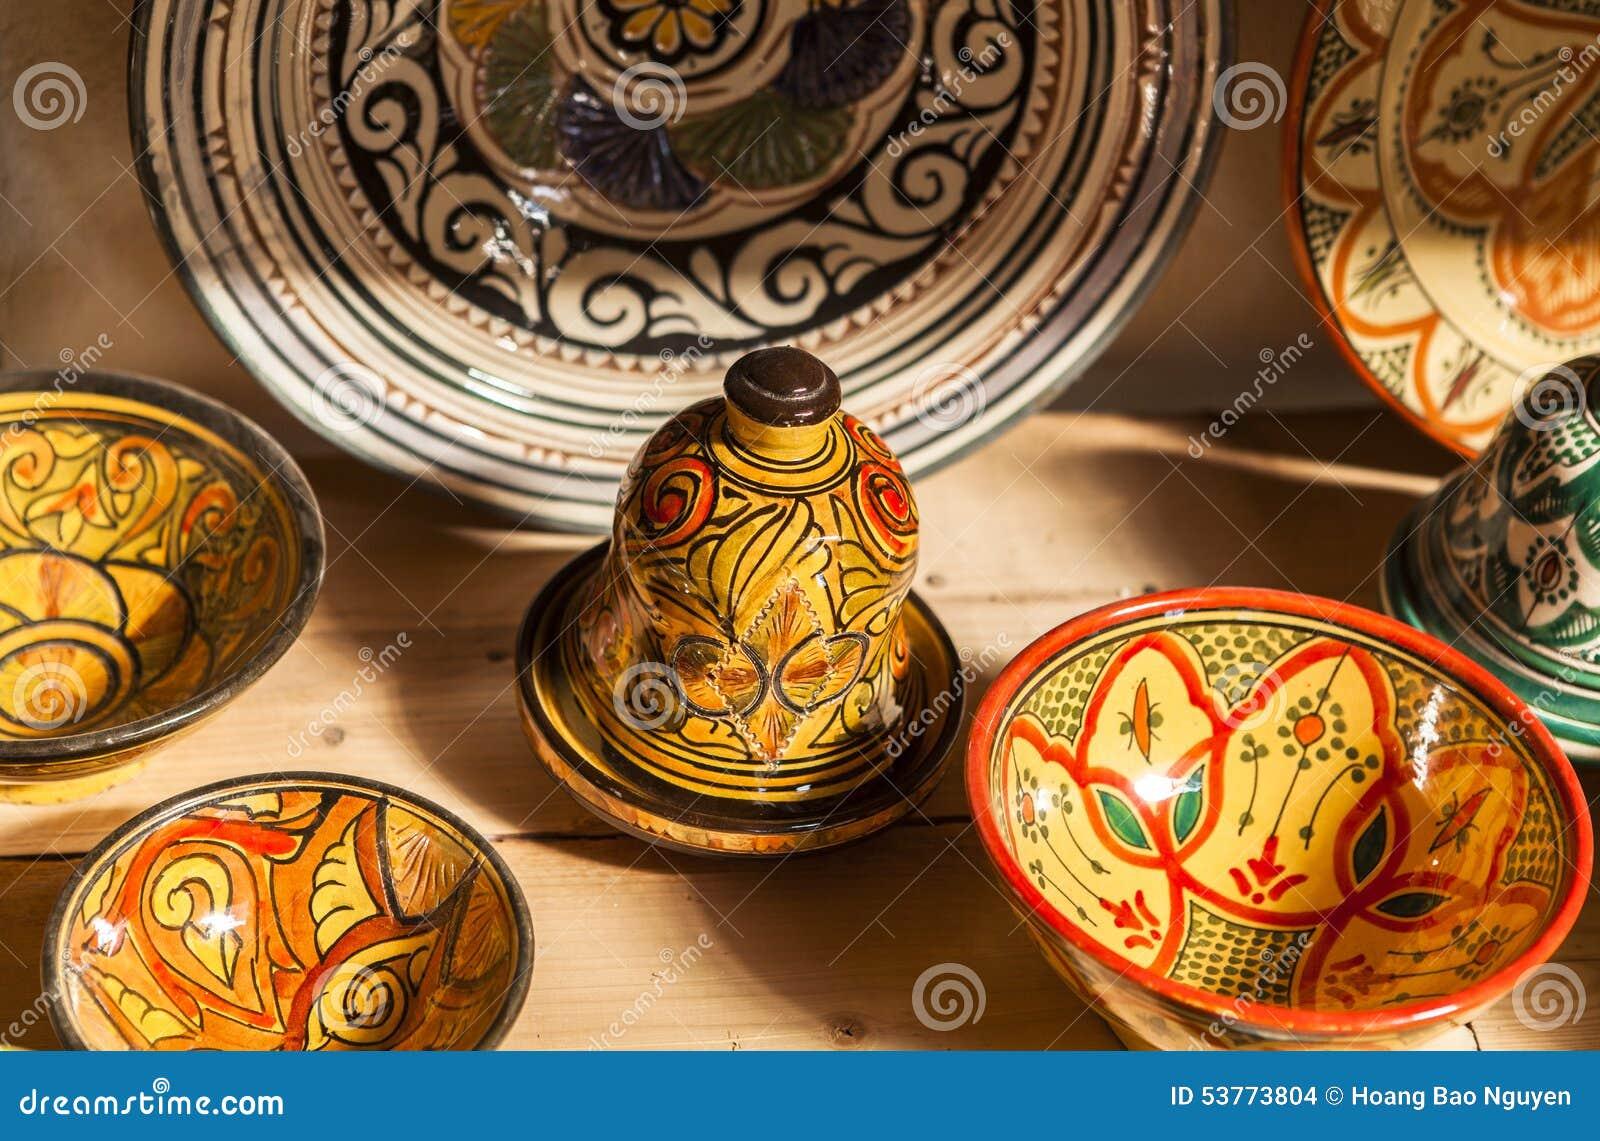 Ceramic Souvenirs Of Fez Morocco Stock Photo Image